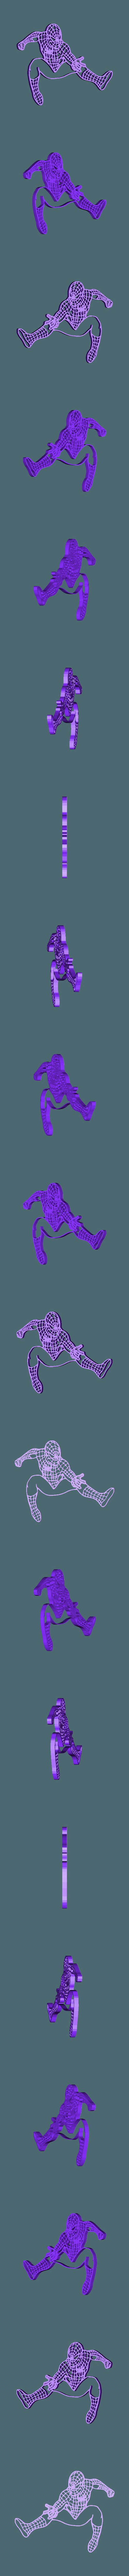 spider man 4.stl Télécharger fichier STL art mural Spiderman • Plan à imprimer en 3D, liggett1